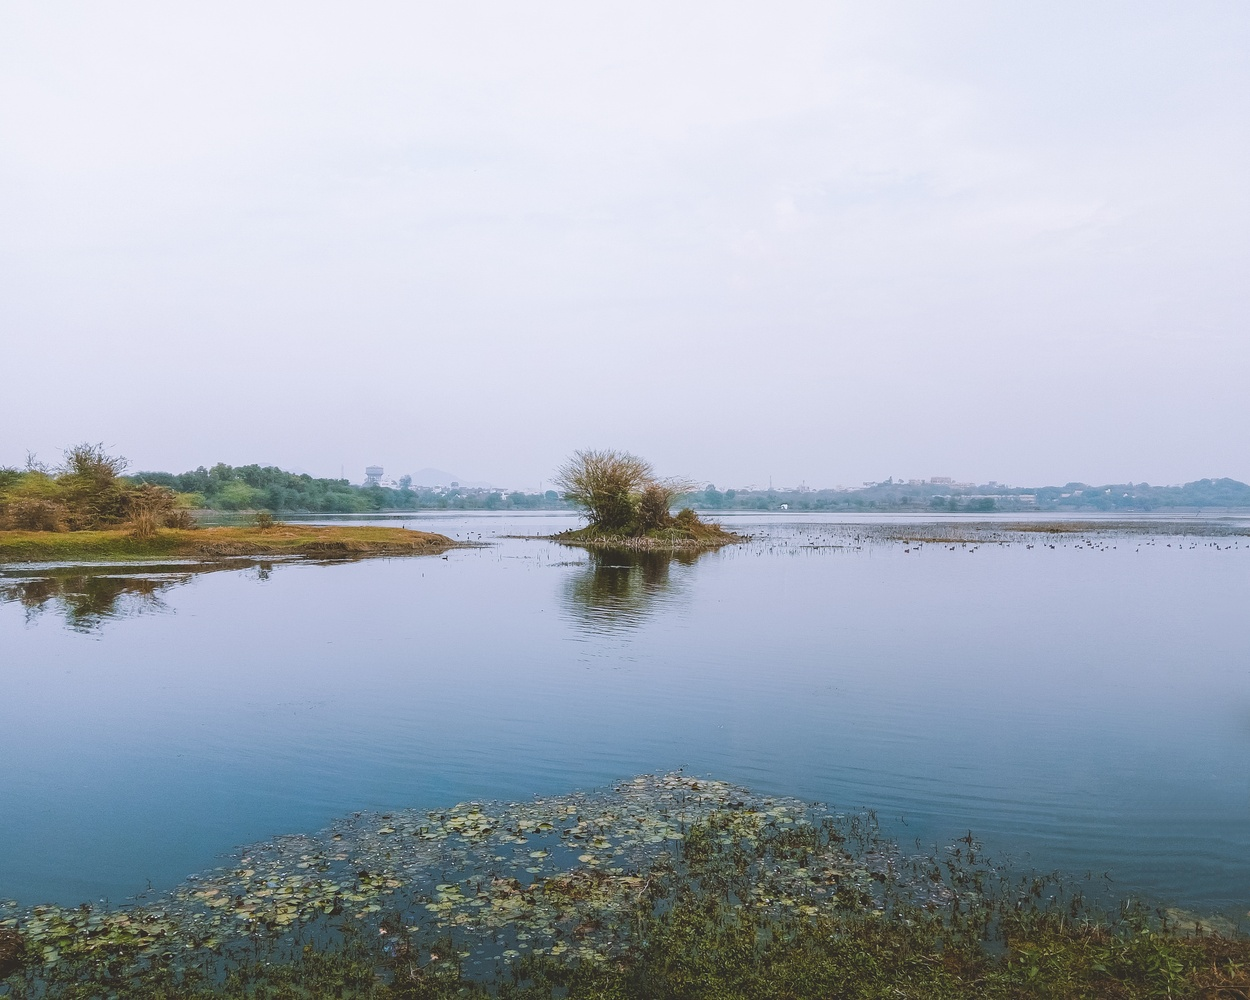 Lake Pichola, Udaipur by Bhupendra Ranawat